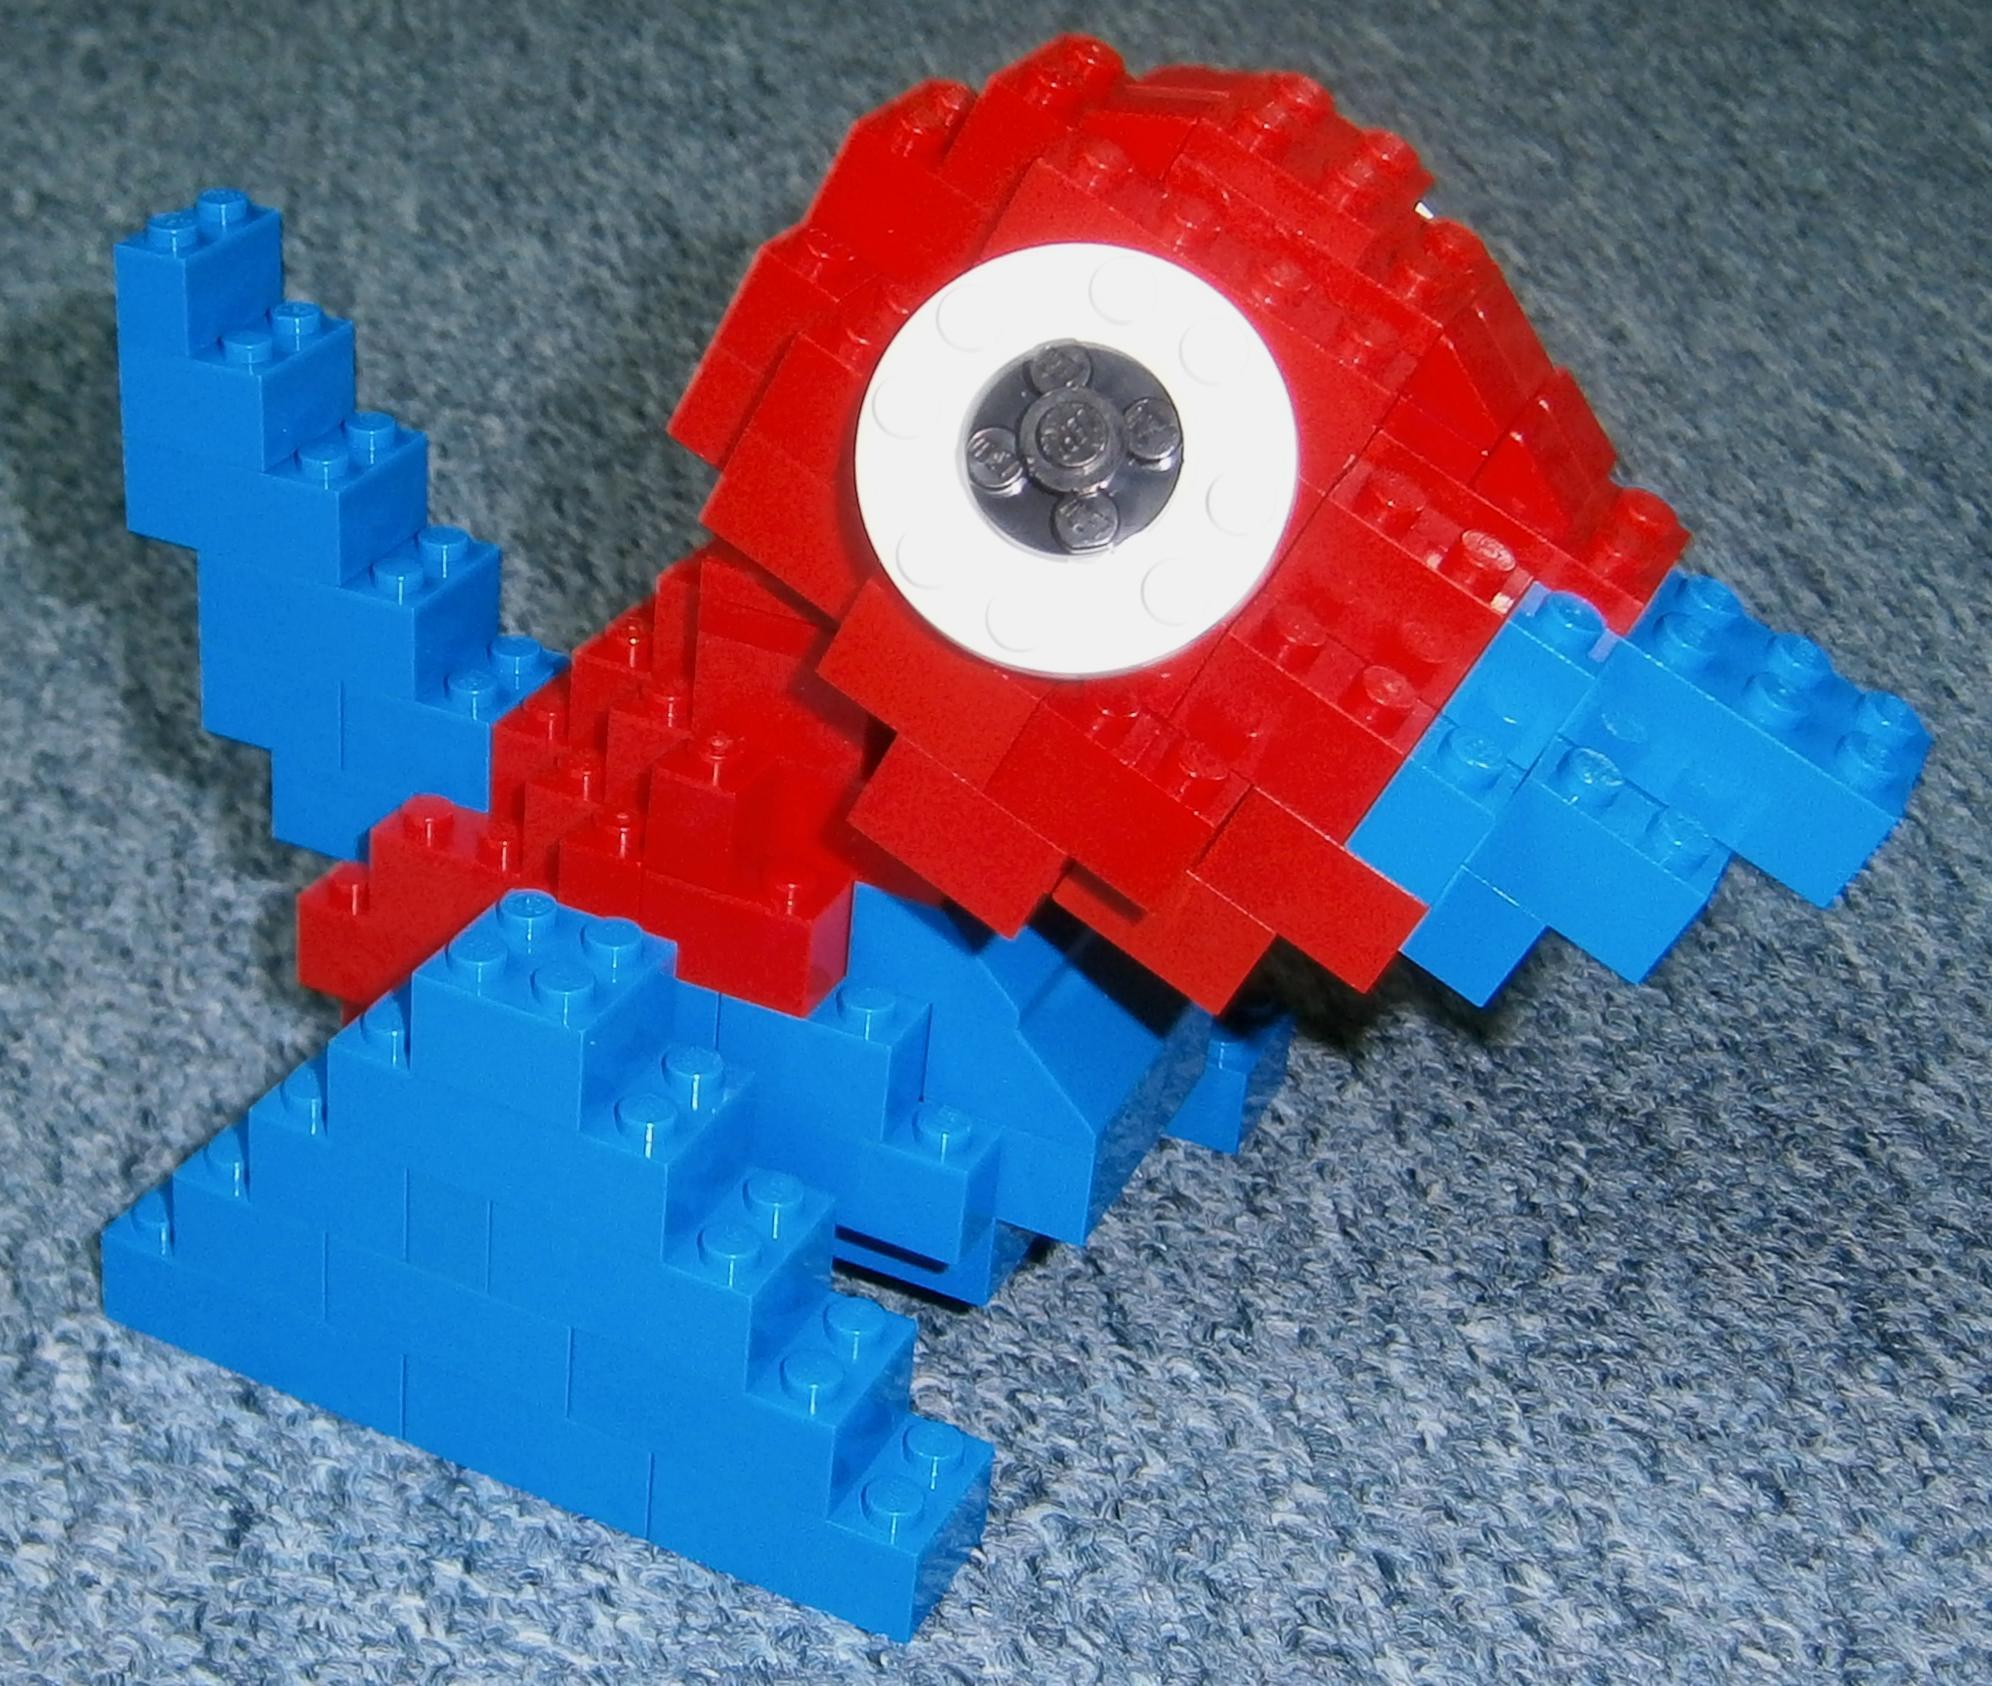 Pokémon-Fanart: LEGO Porygon